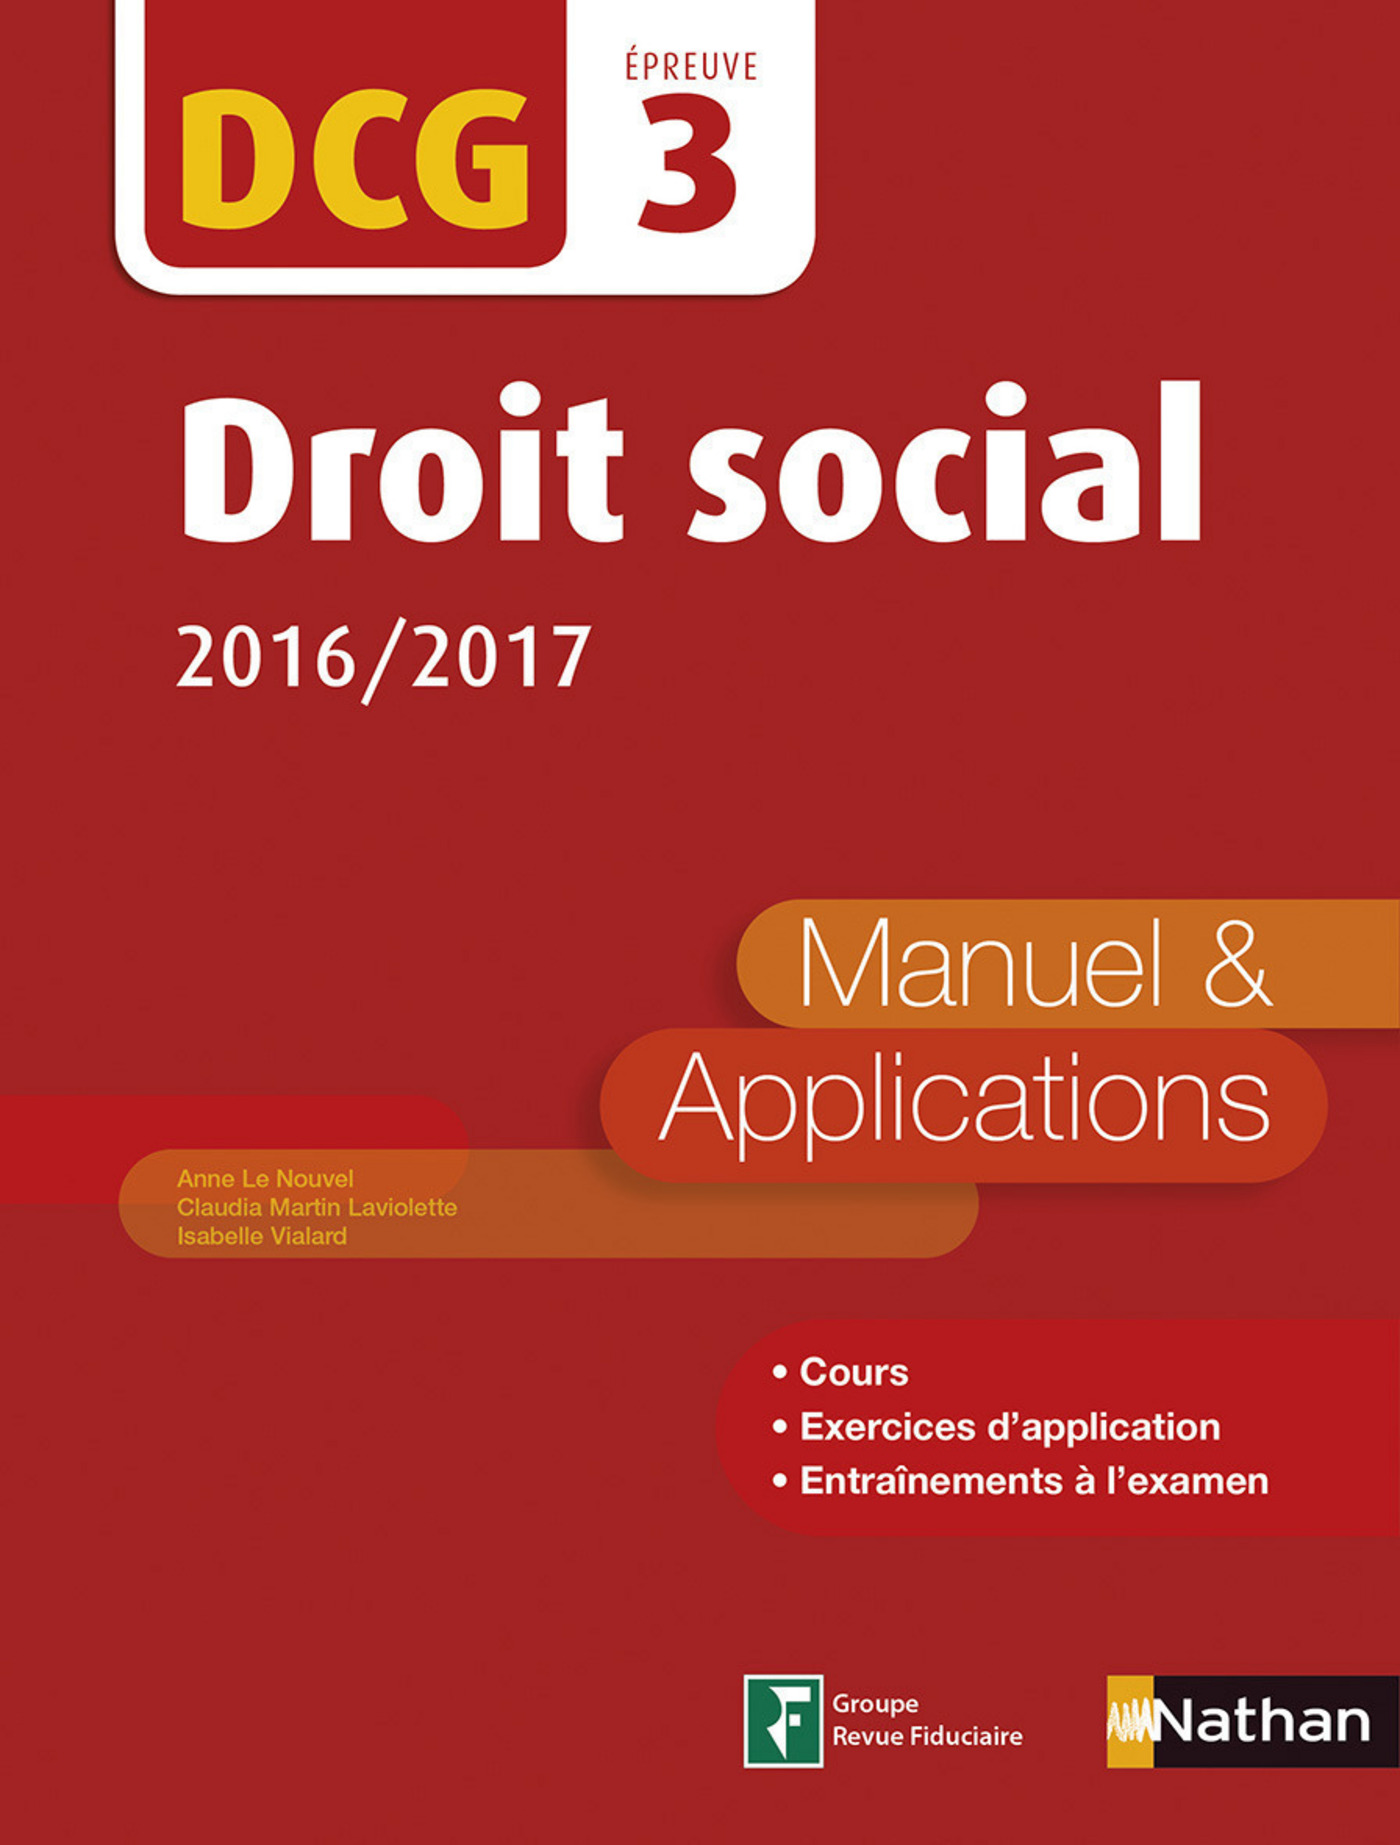 DCG 3 : Droit social 2016/2017 (ebook)